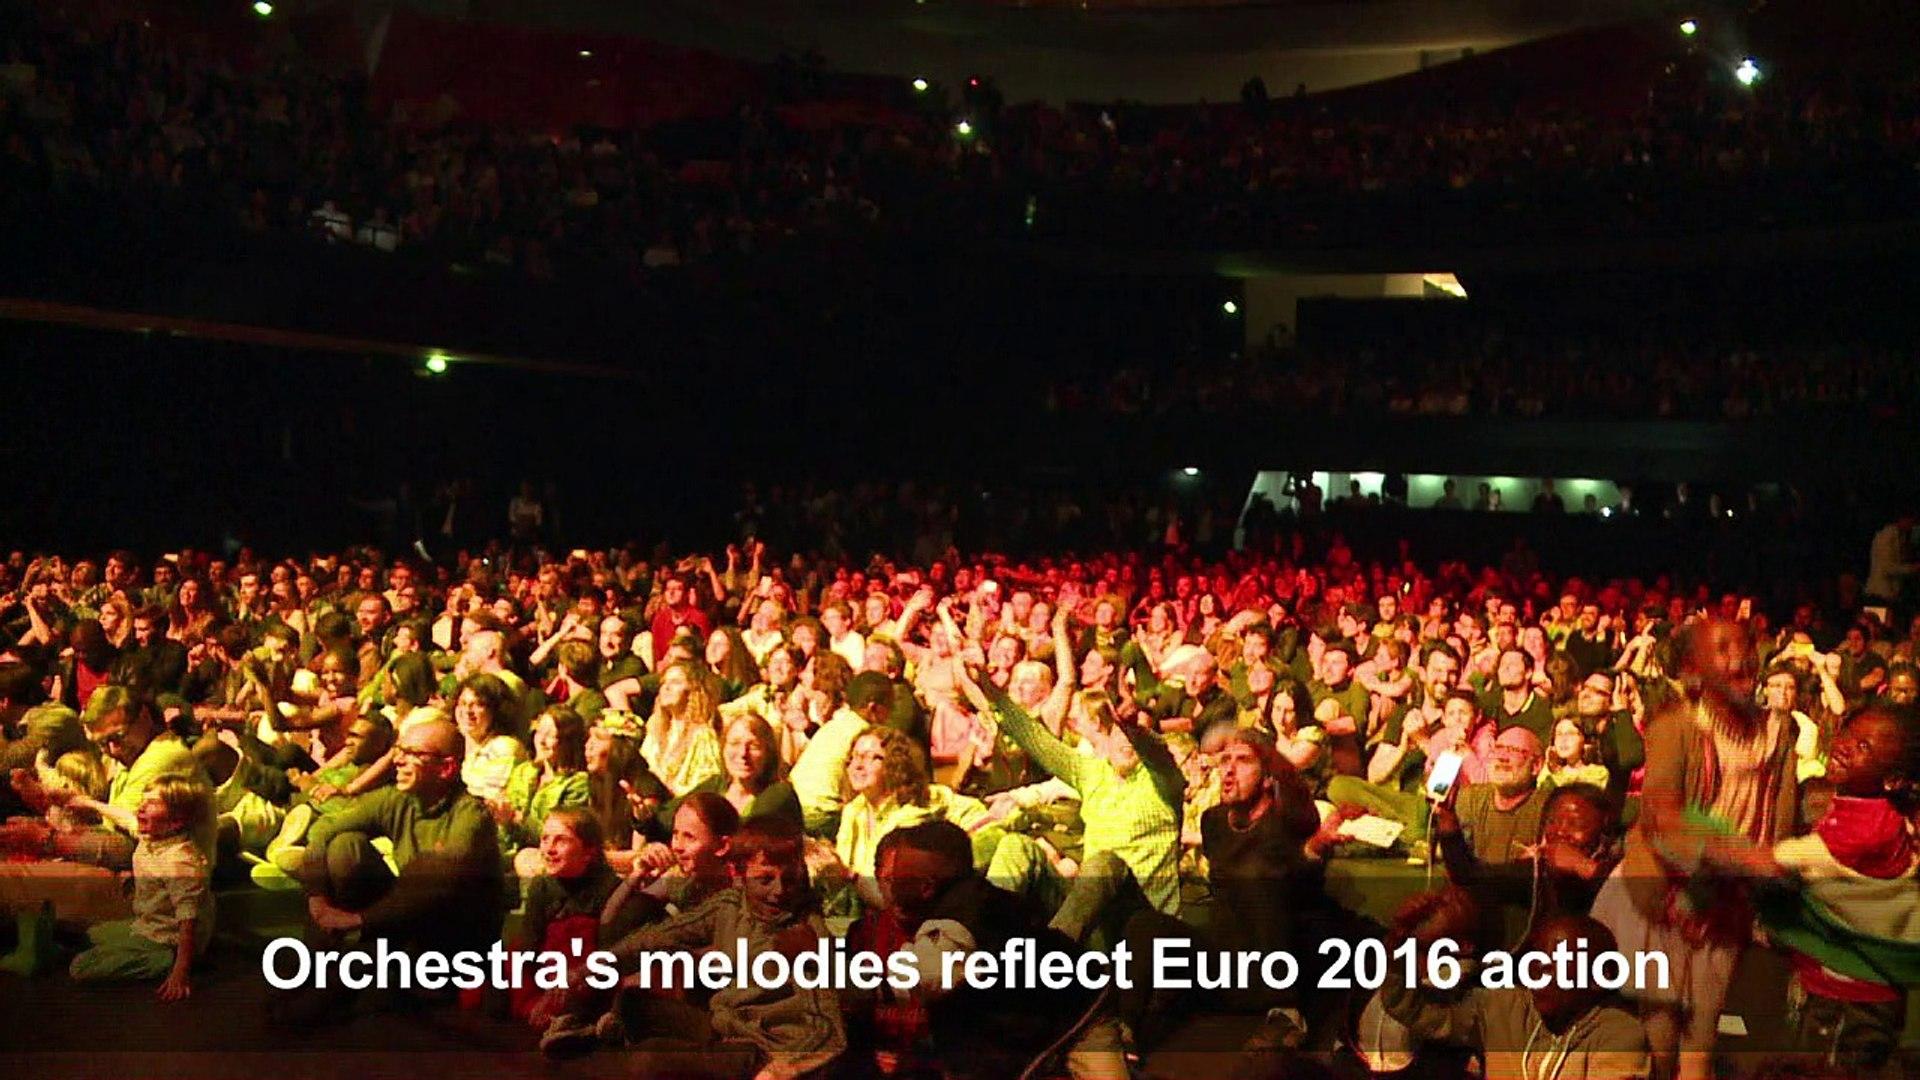 Paris musicians interpret Spain-Croatia Euro 2016 match